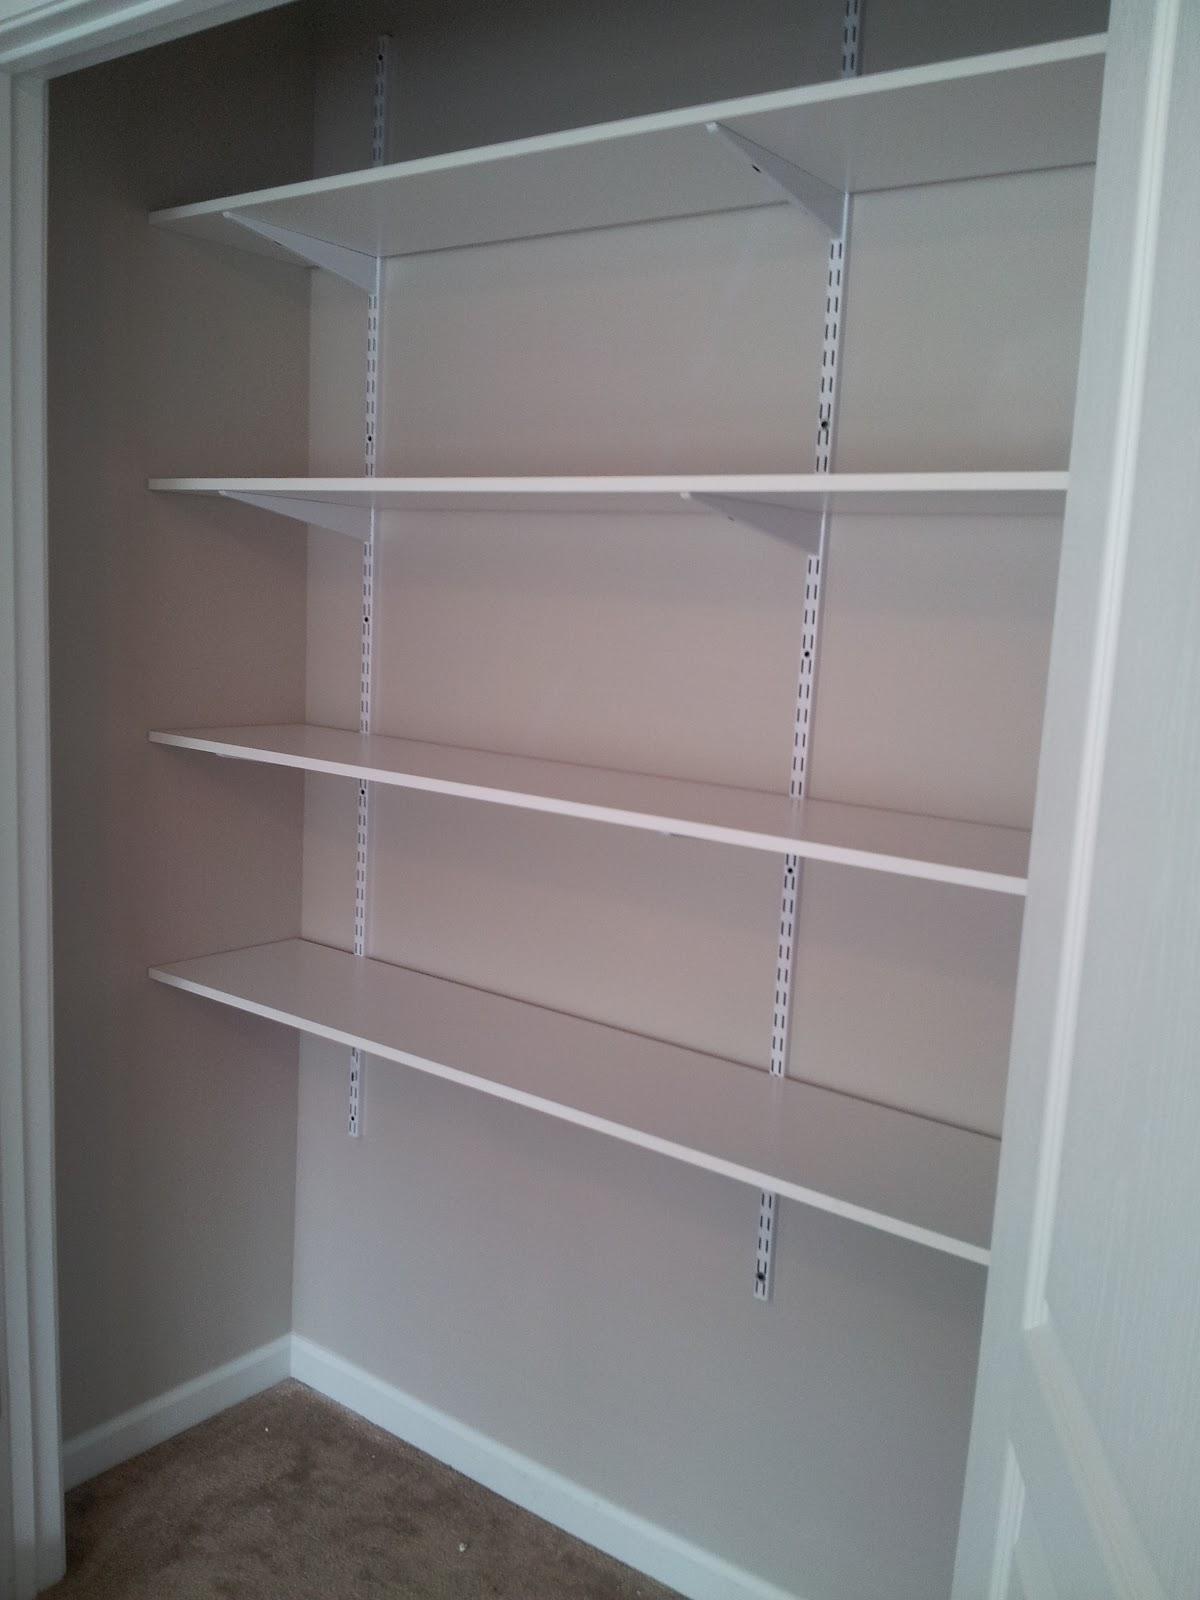 Duo ventures creativity closet makeover for Home shelving systems